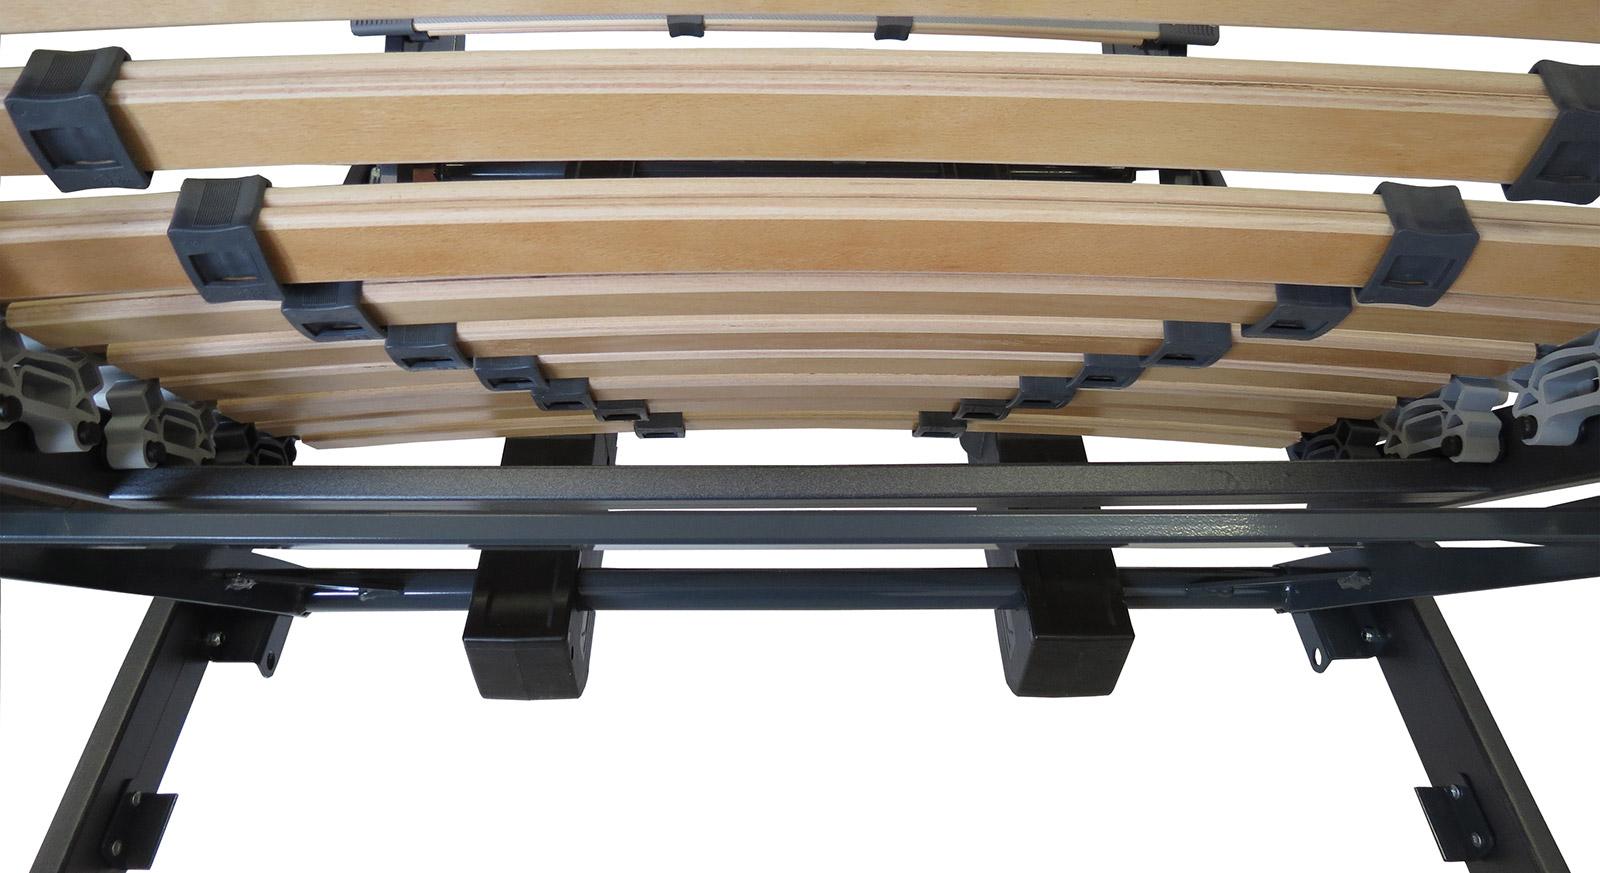 Lattenrost orthowell ultraflex XXXL motor mit stabilen Federleisten